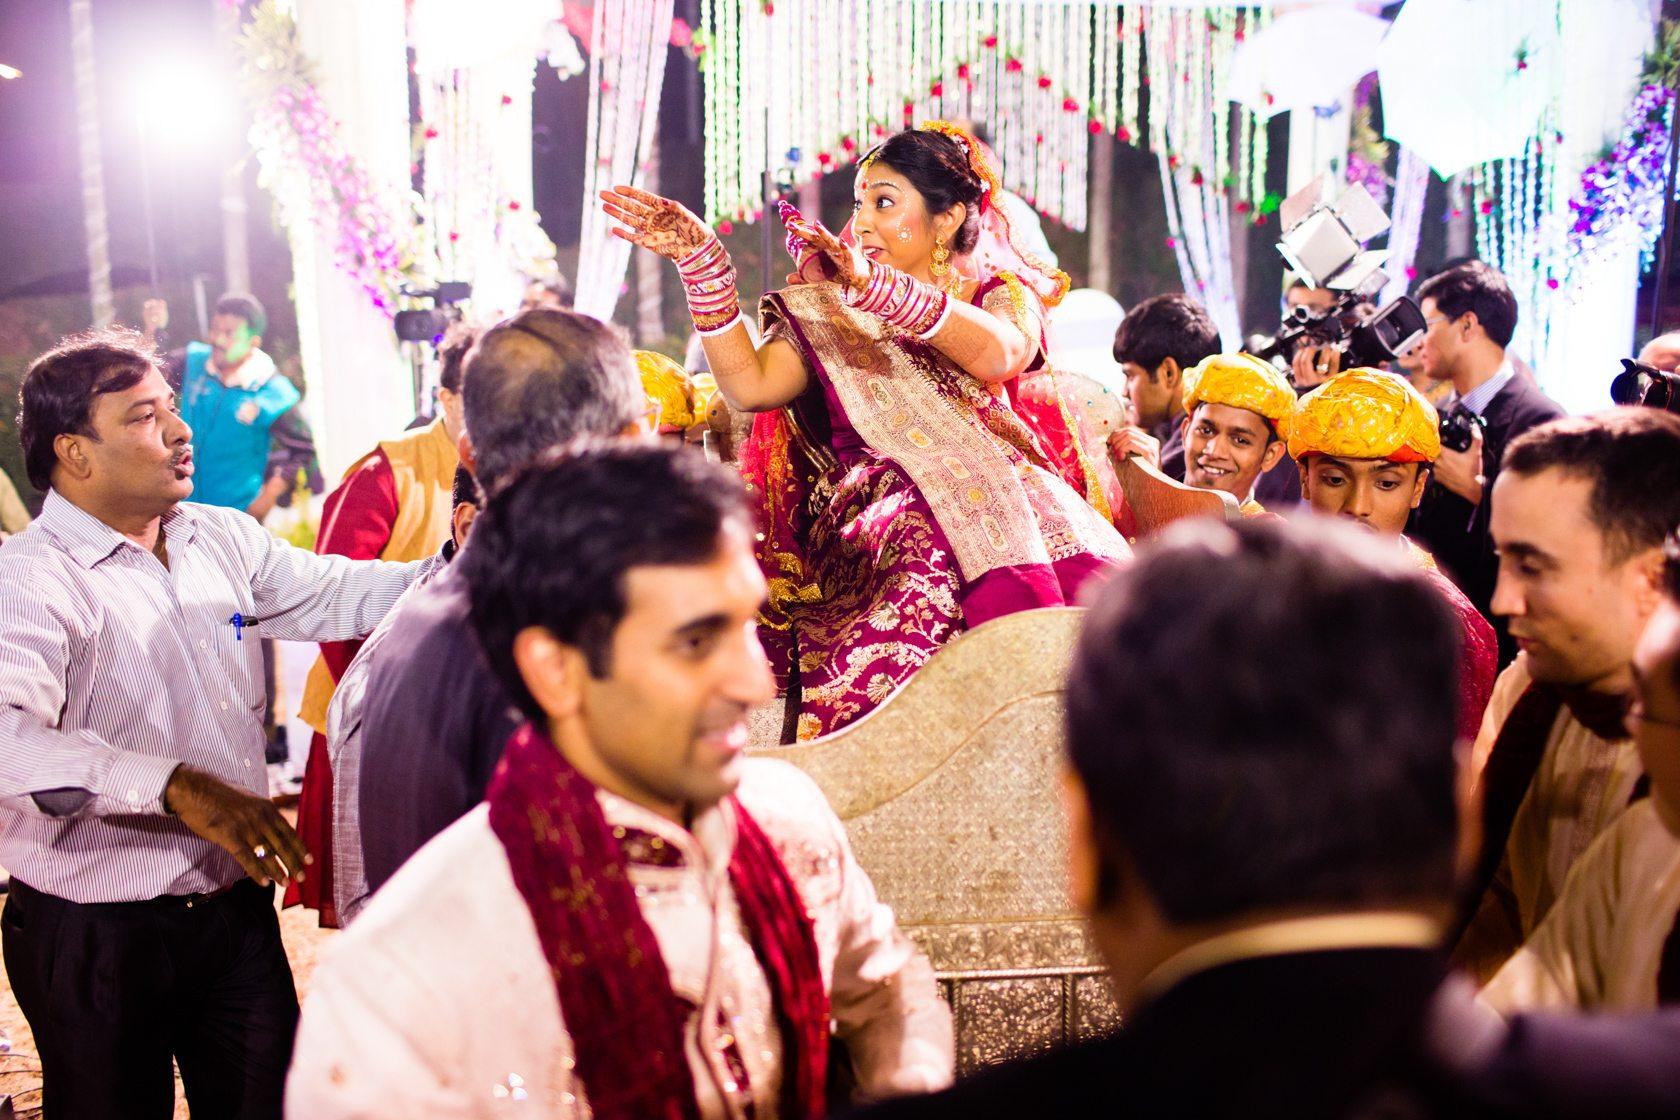 India_Wedding_149.jpg